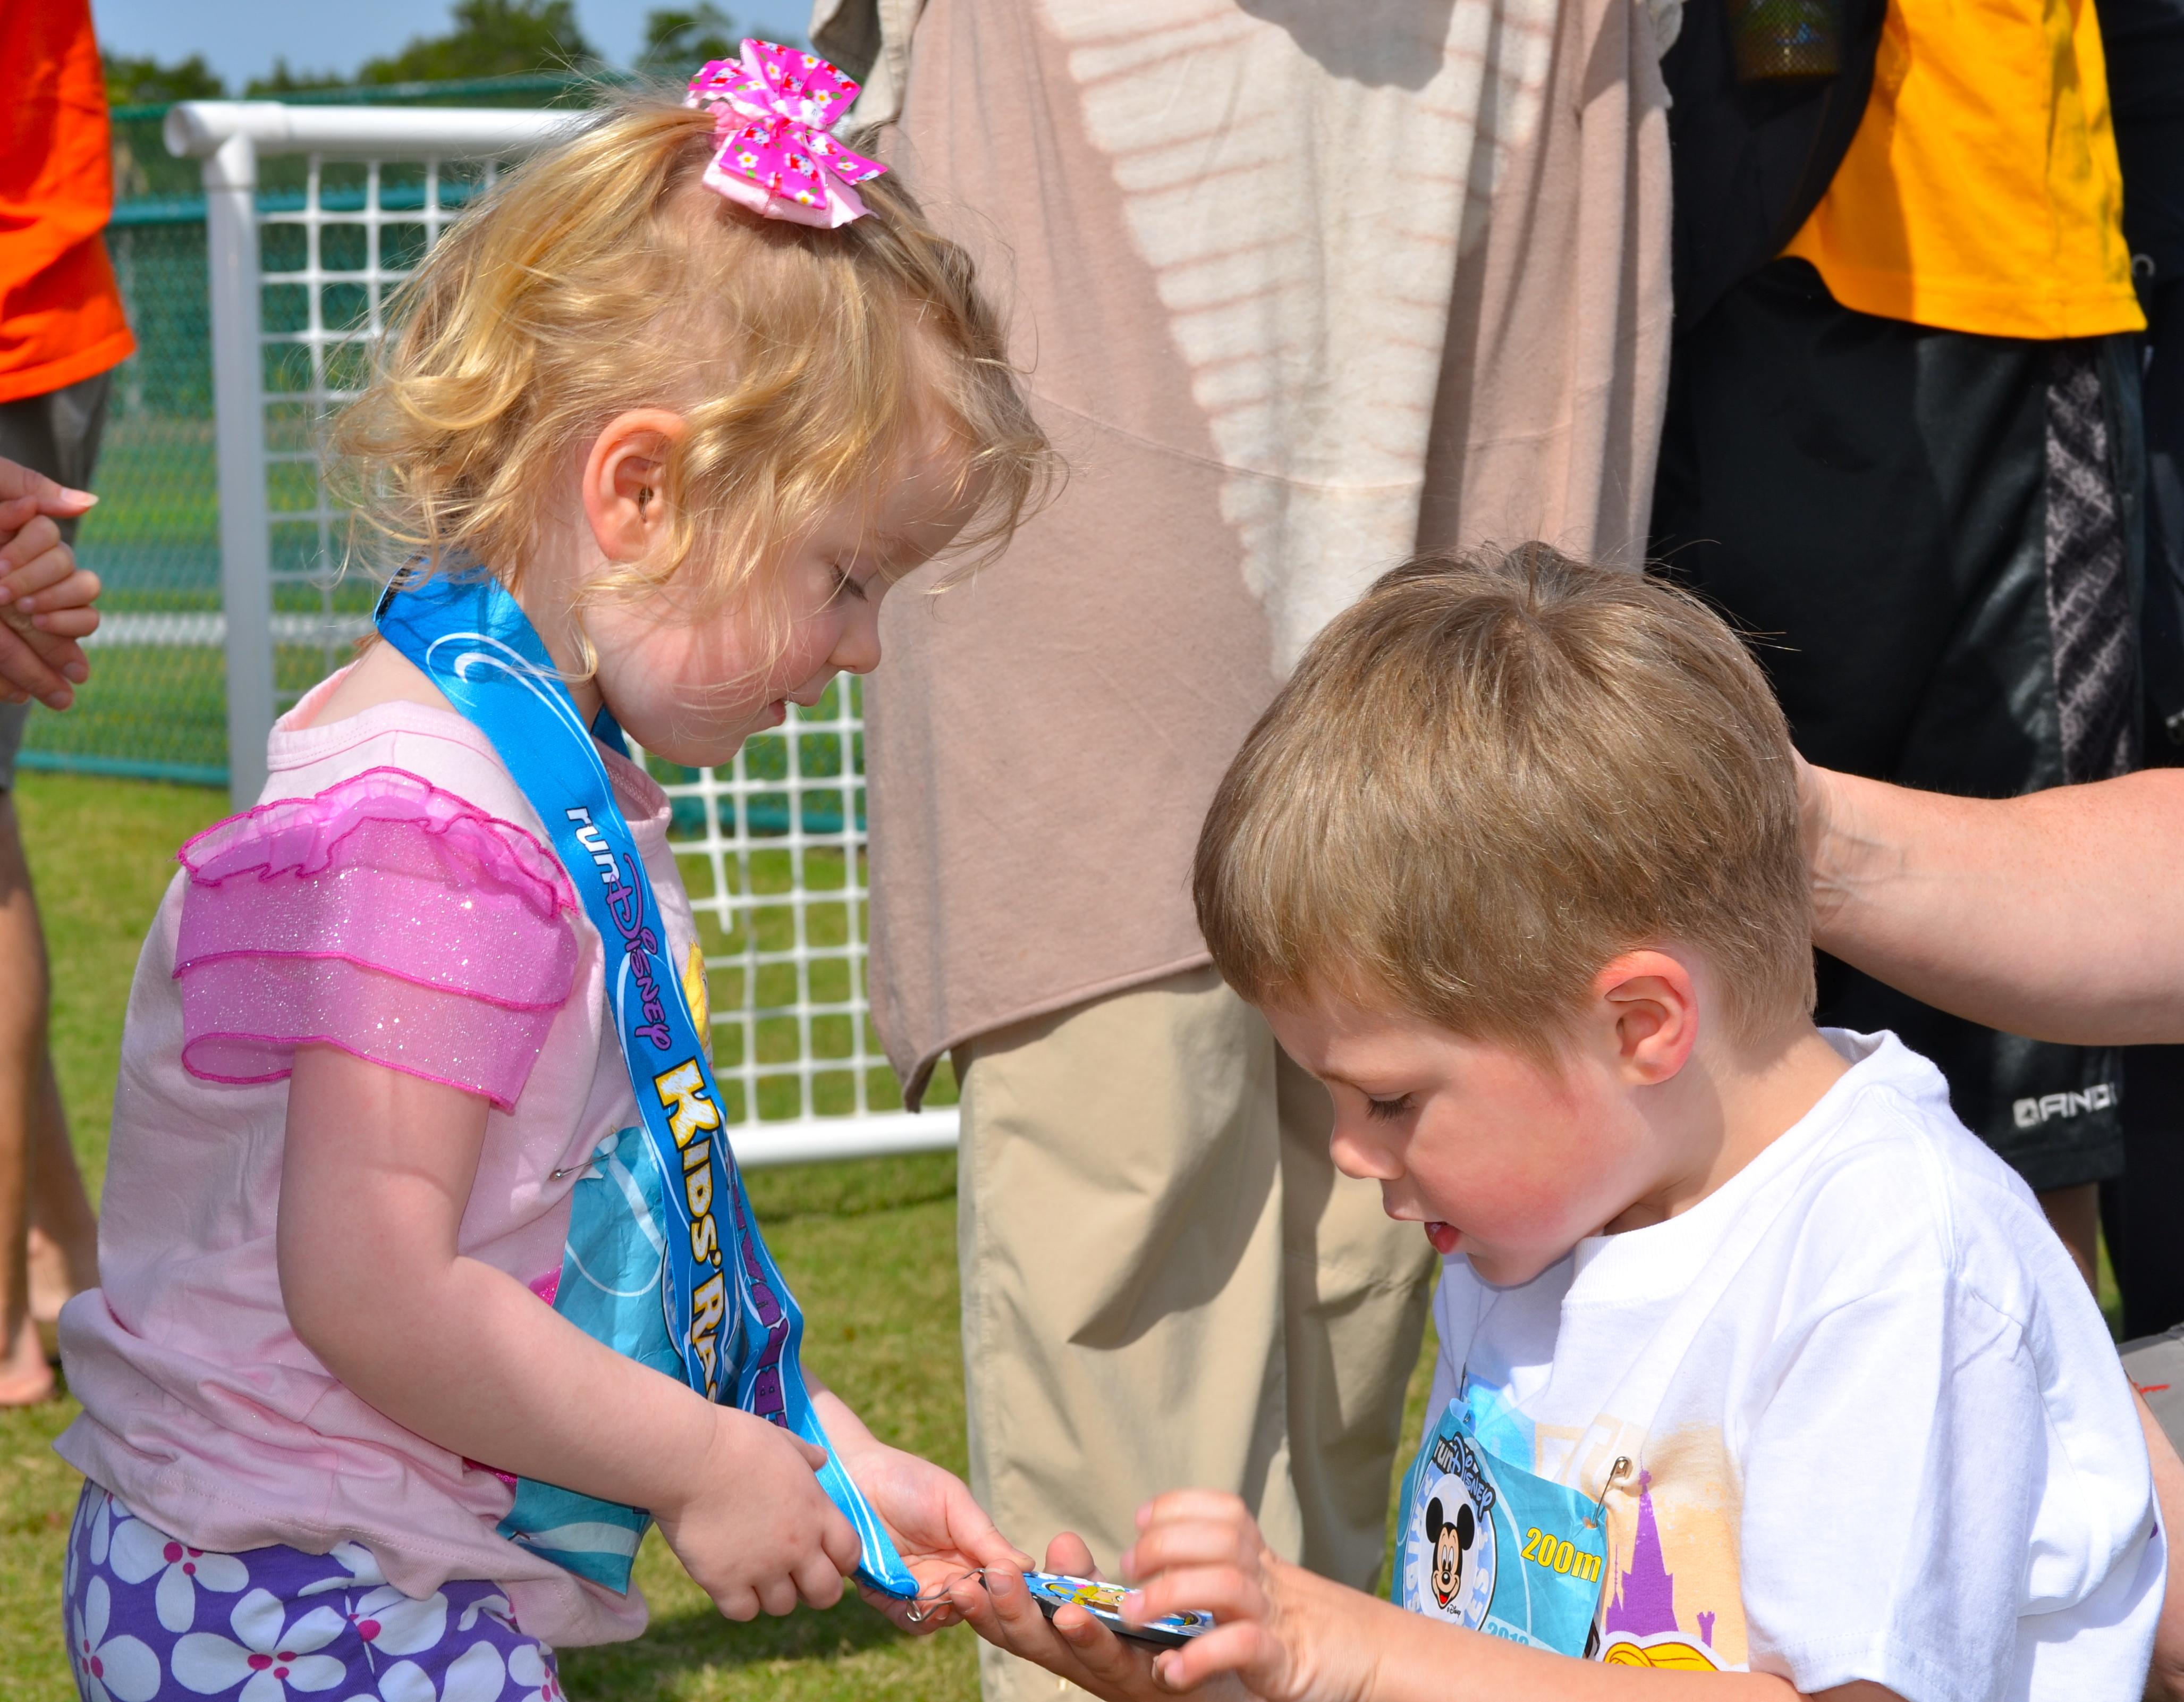 My nephew admires his sister's medal